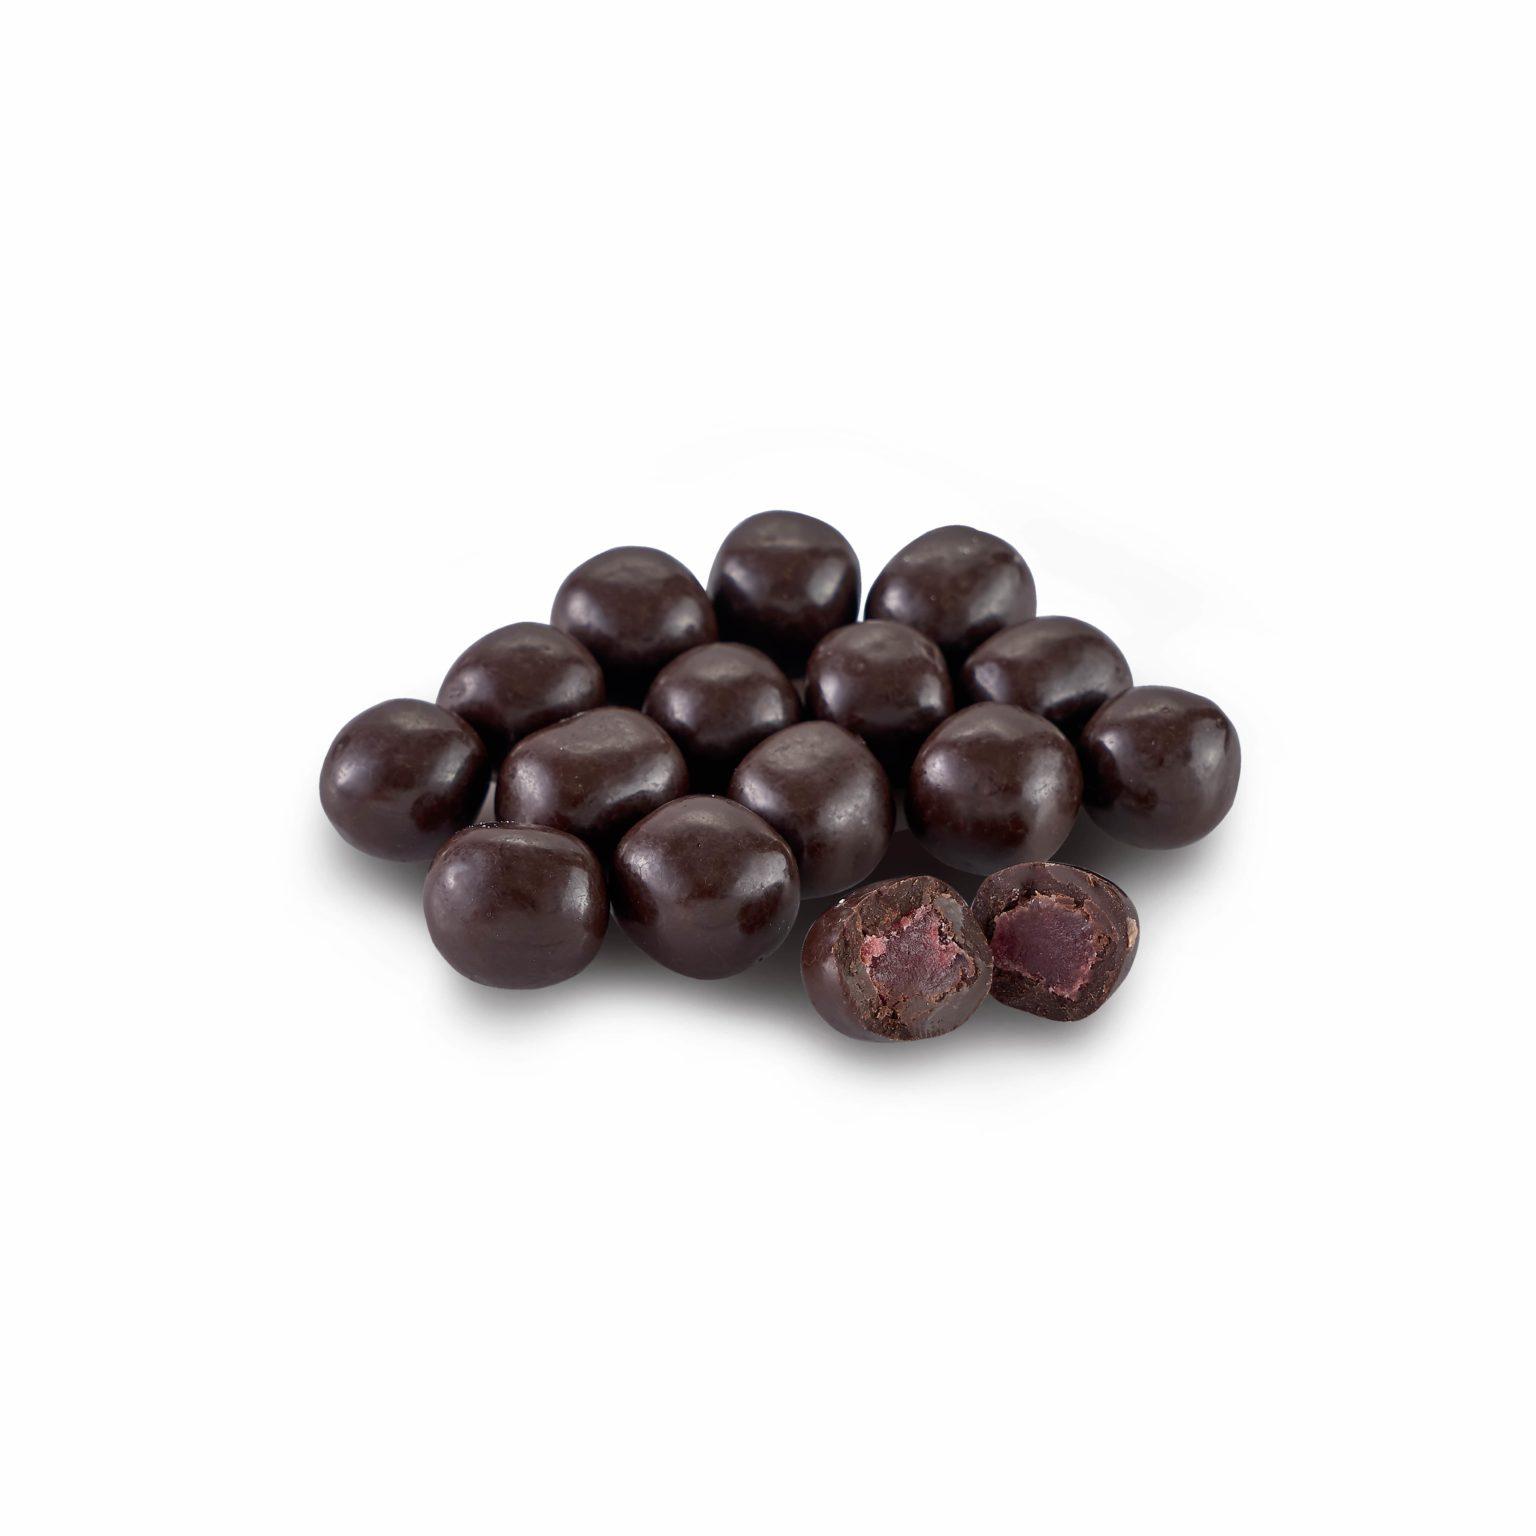 Шоколадное драже «Малина» - фото 2